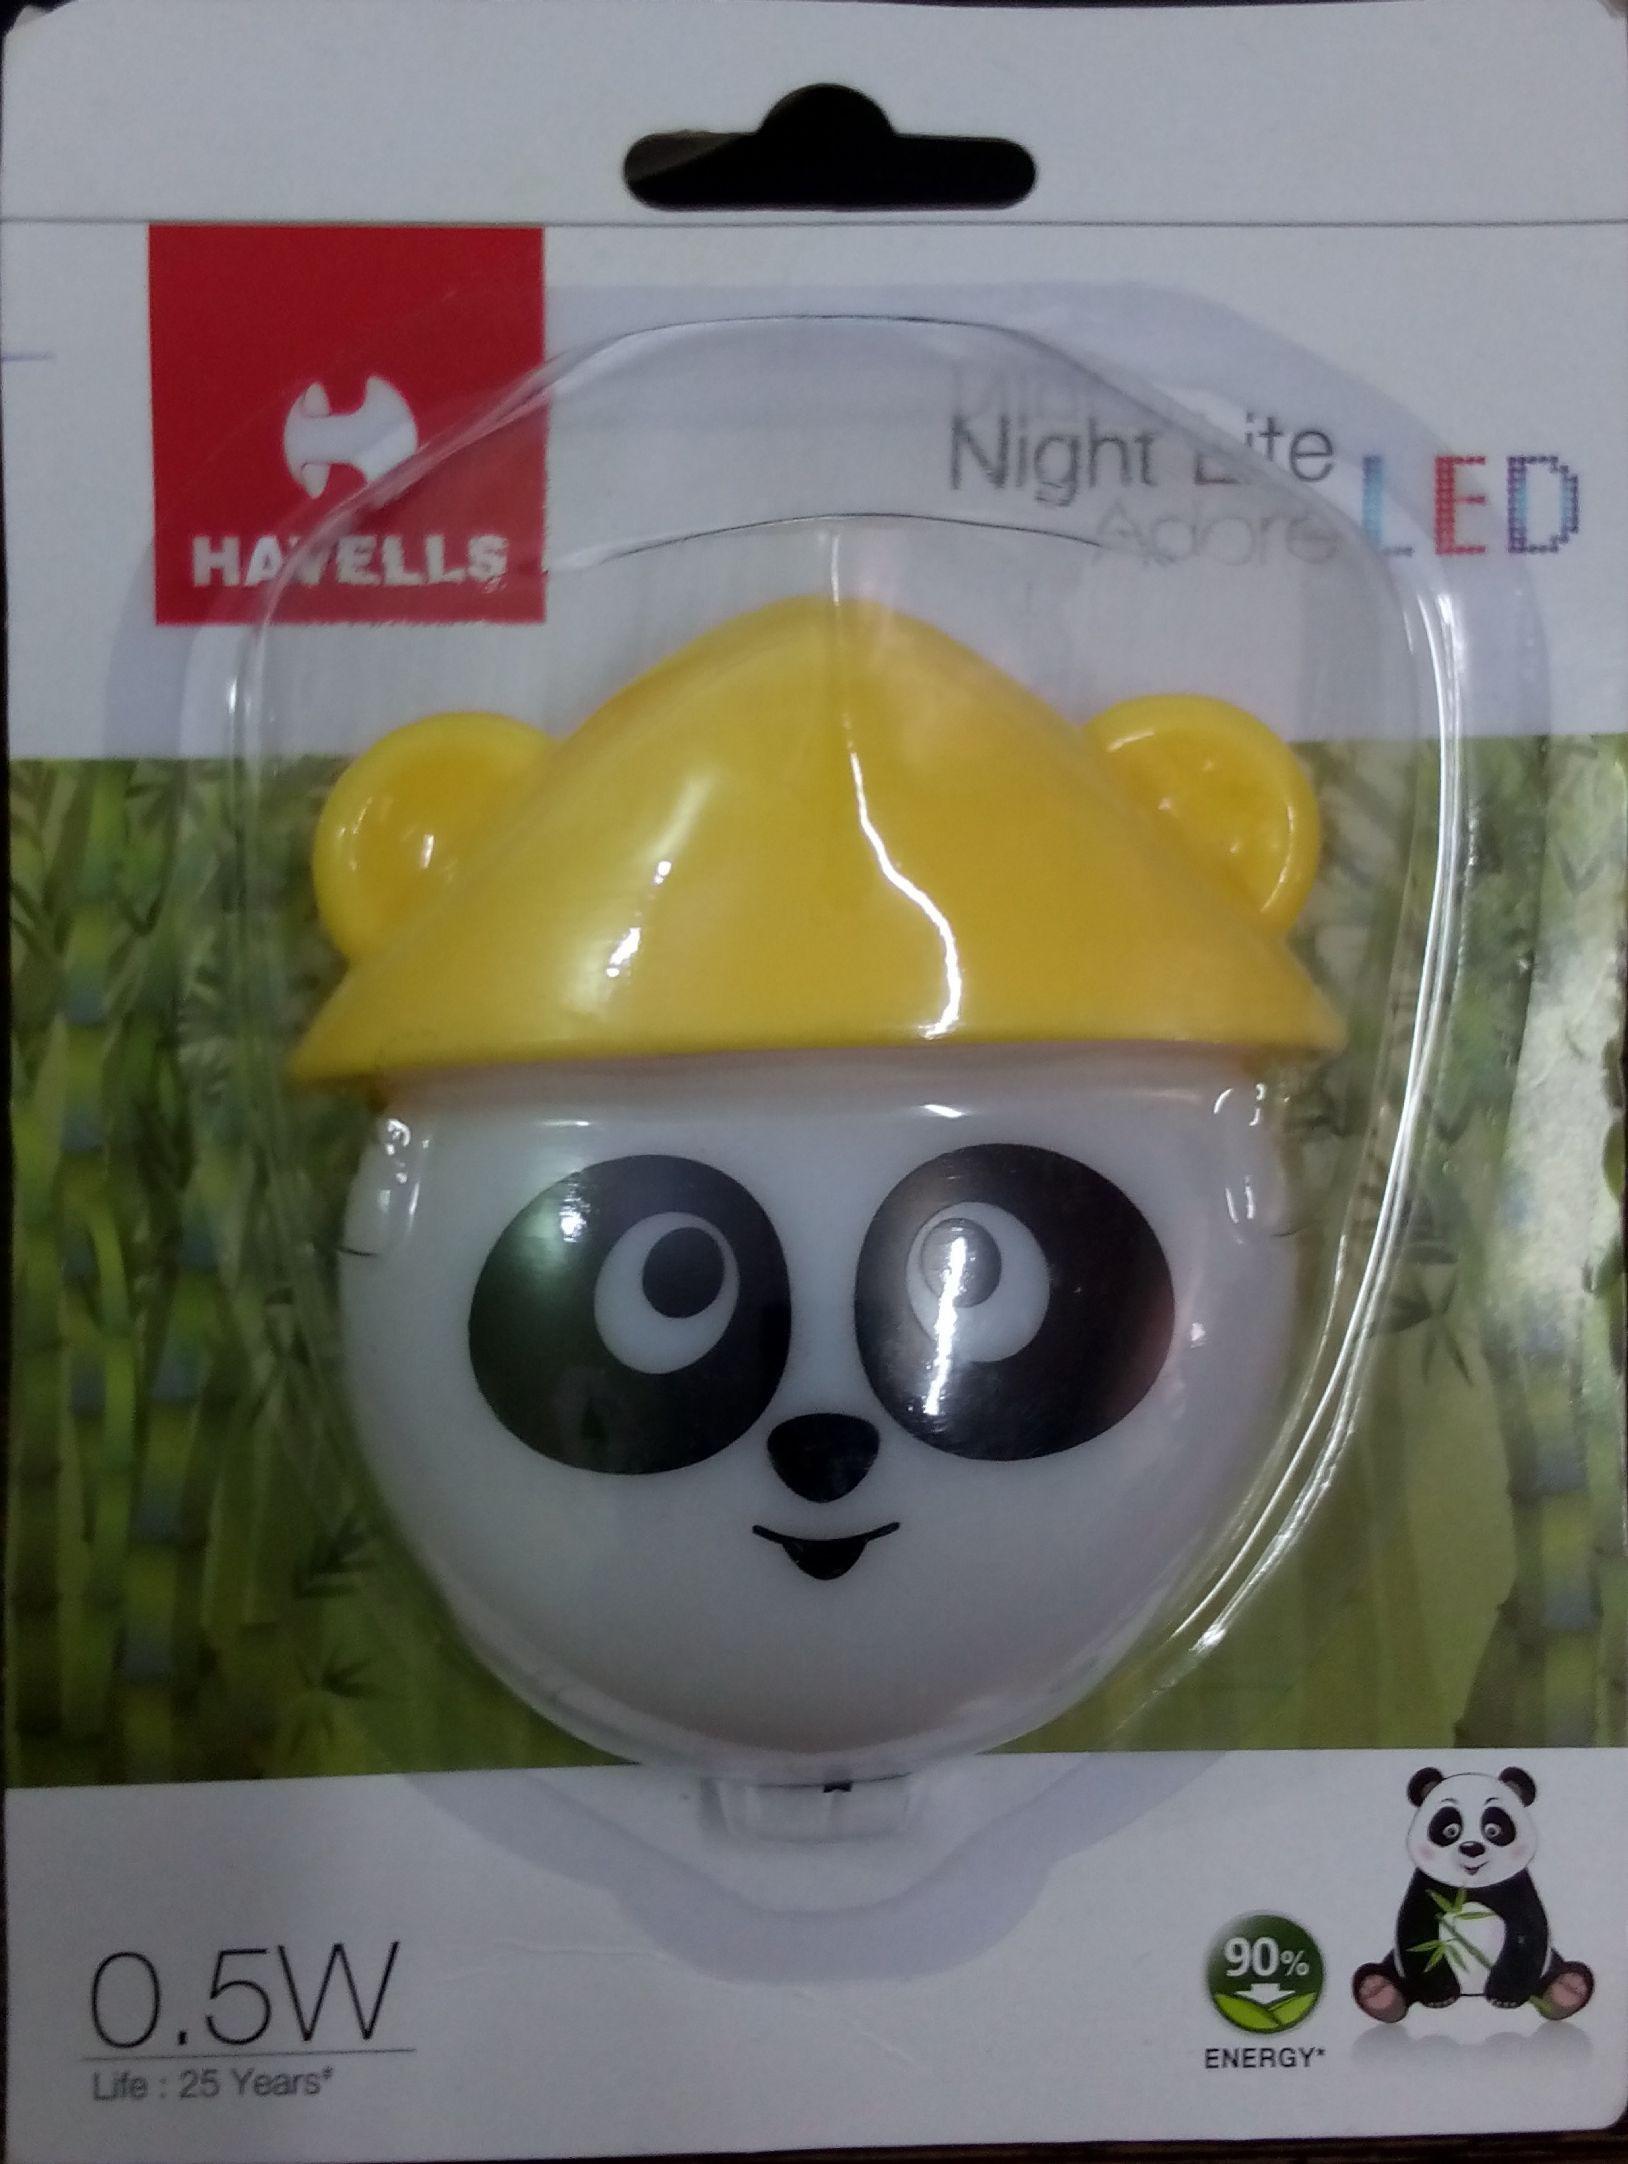 Buy led night lamp online india - Havells Kung Fu Panda Night Lamp